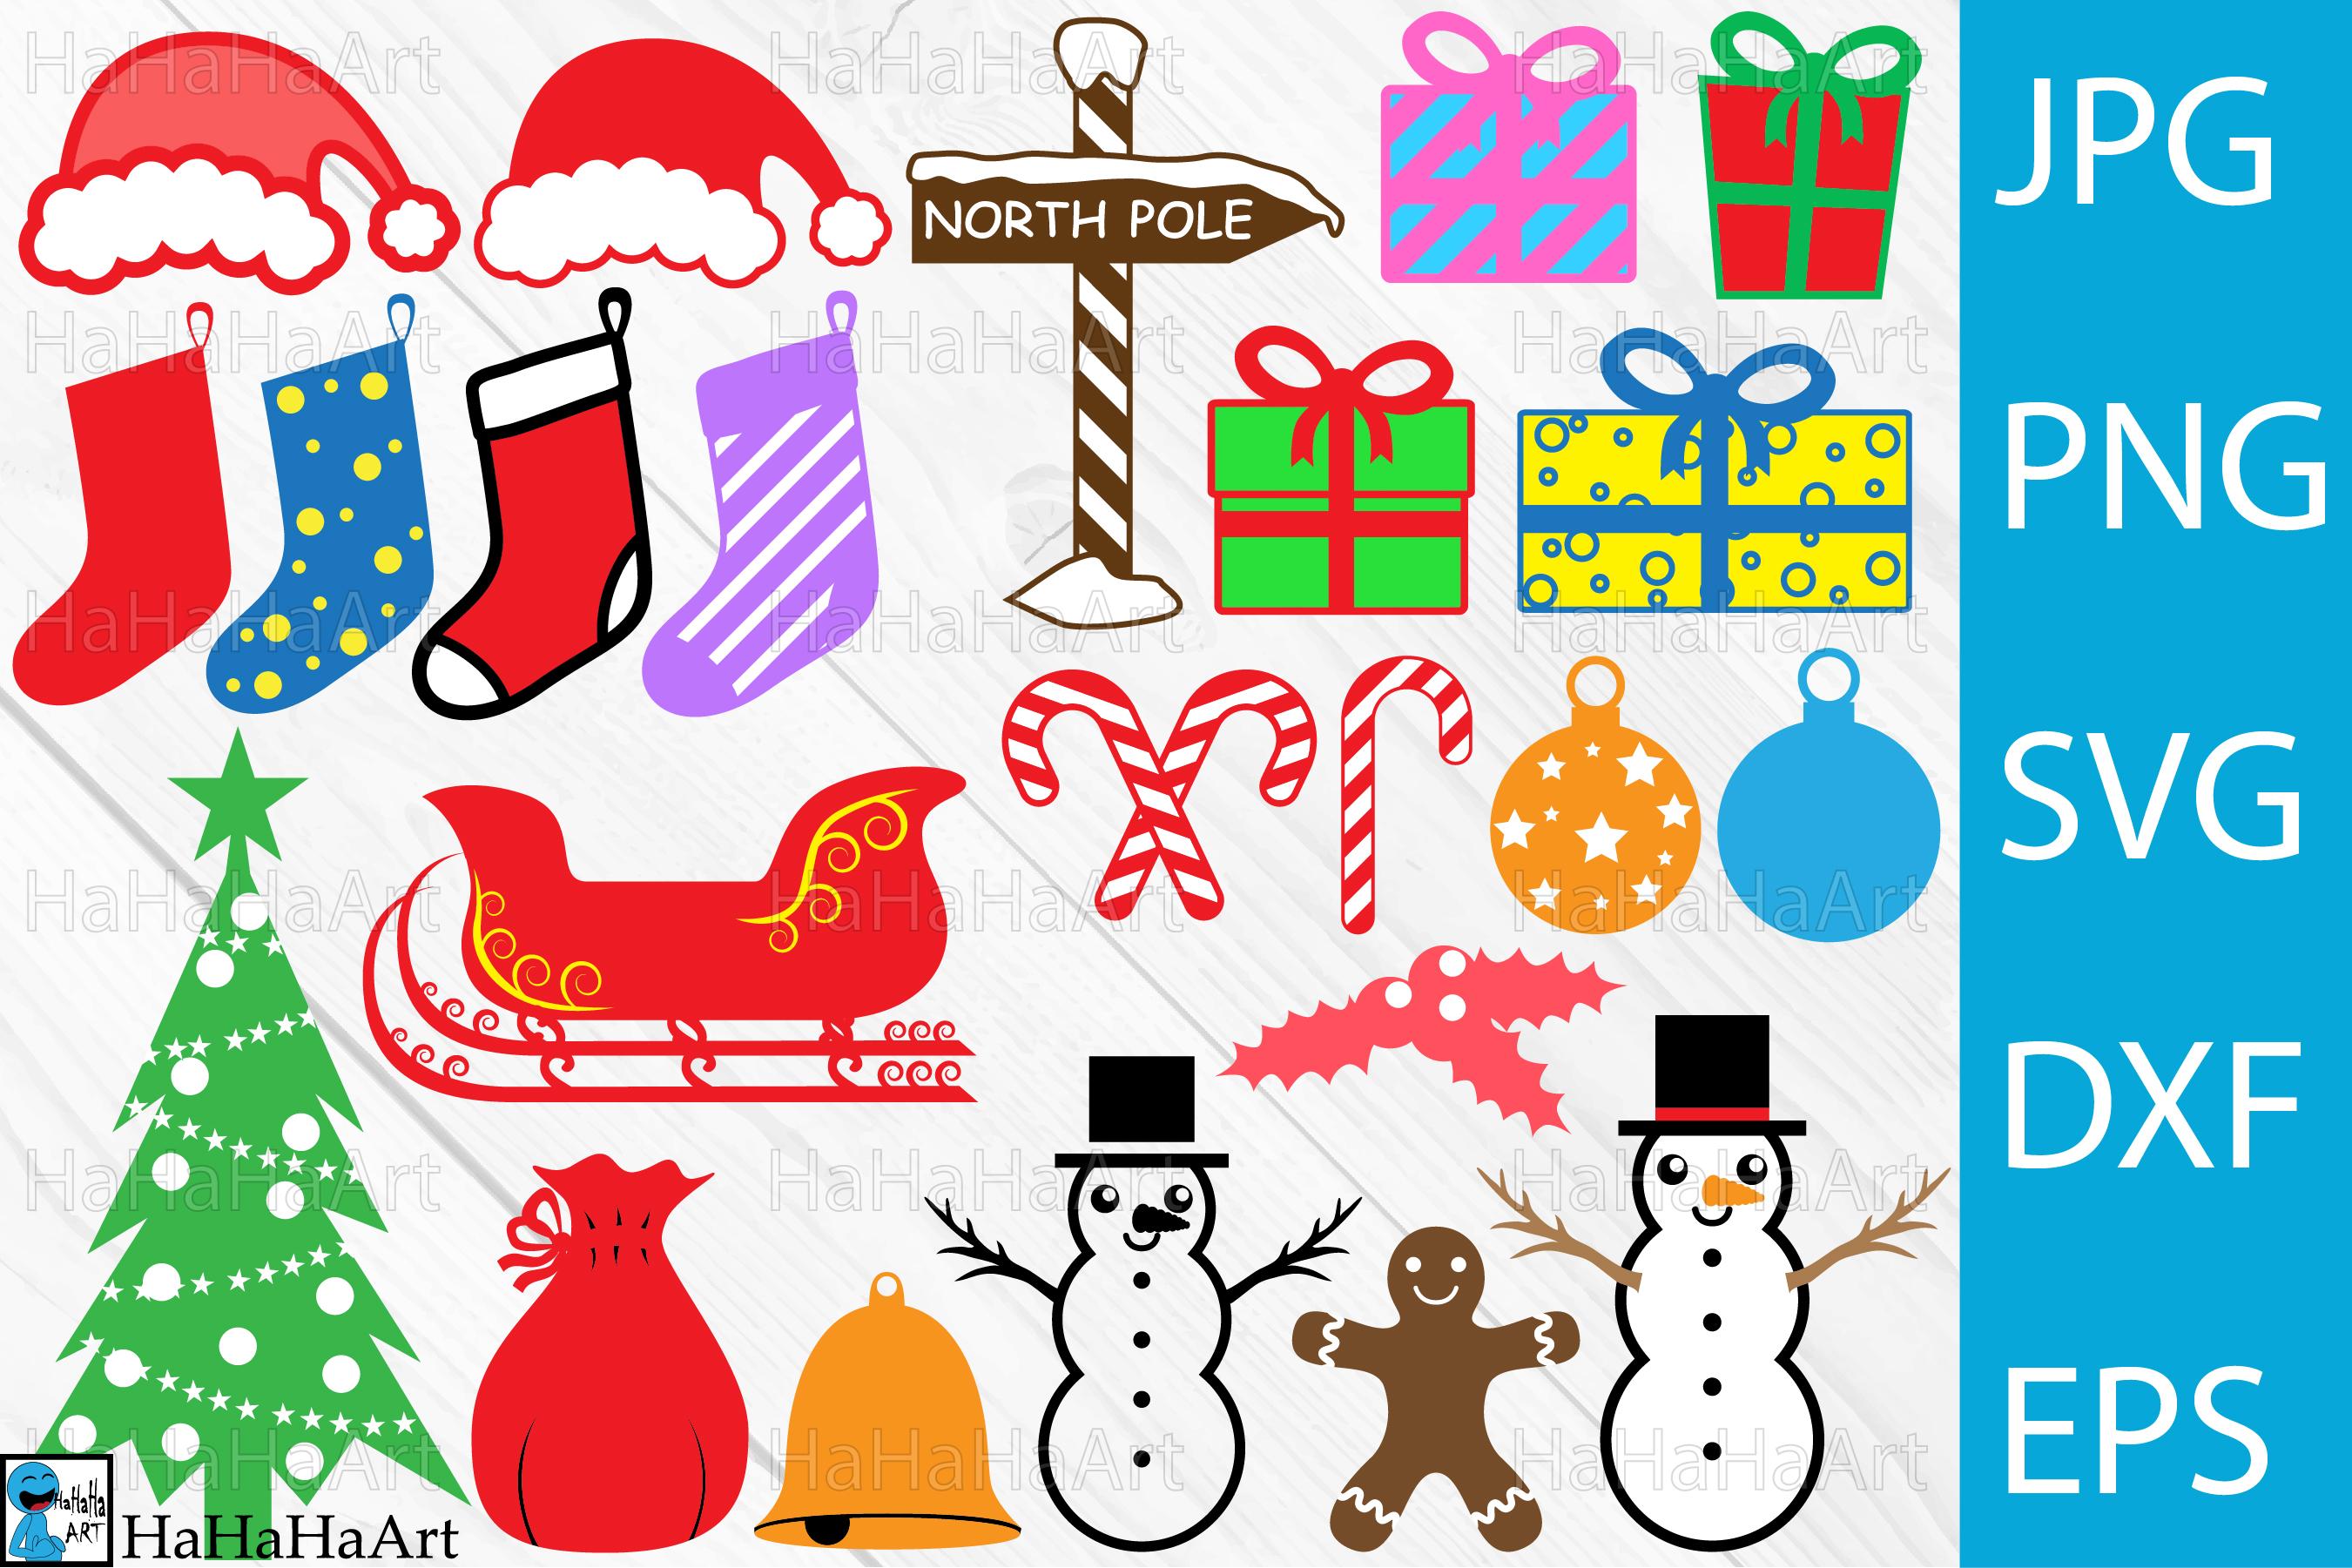 Christmas Designs.Christmas Designs Clip Art Cutting Files 67c